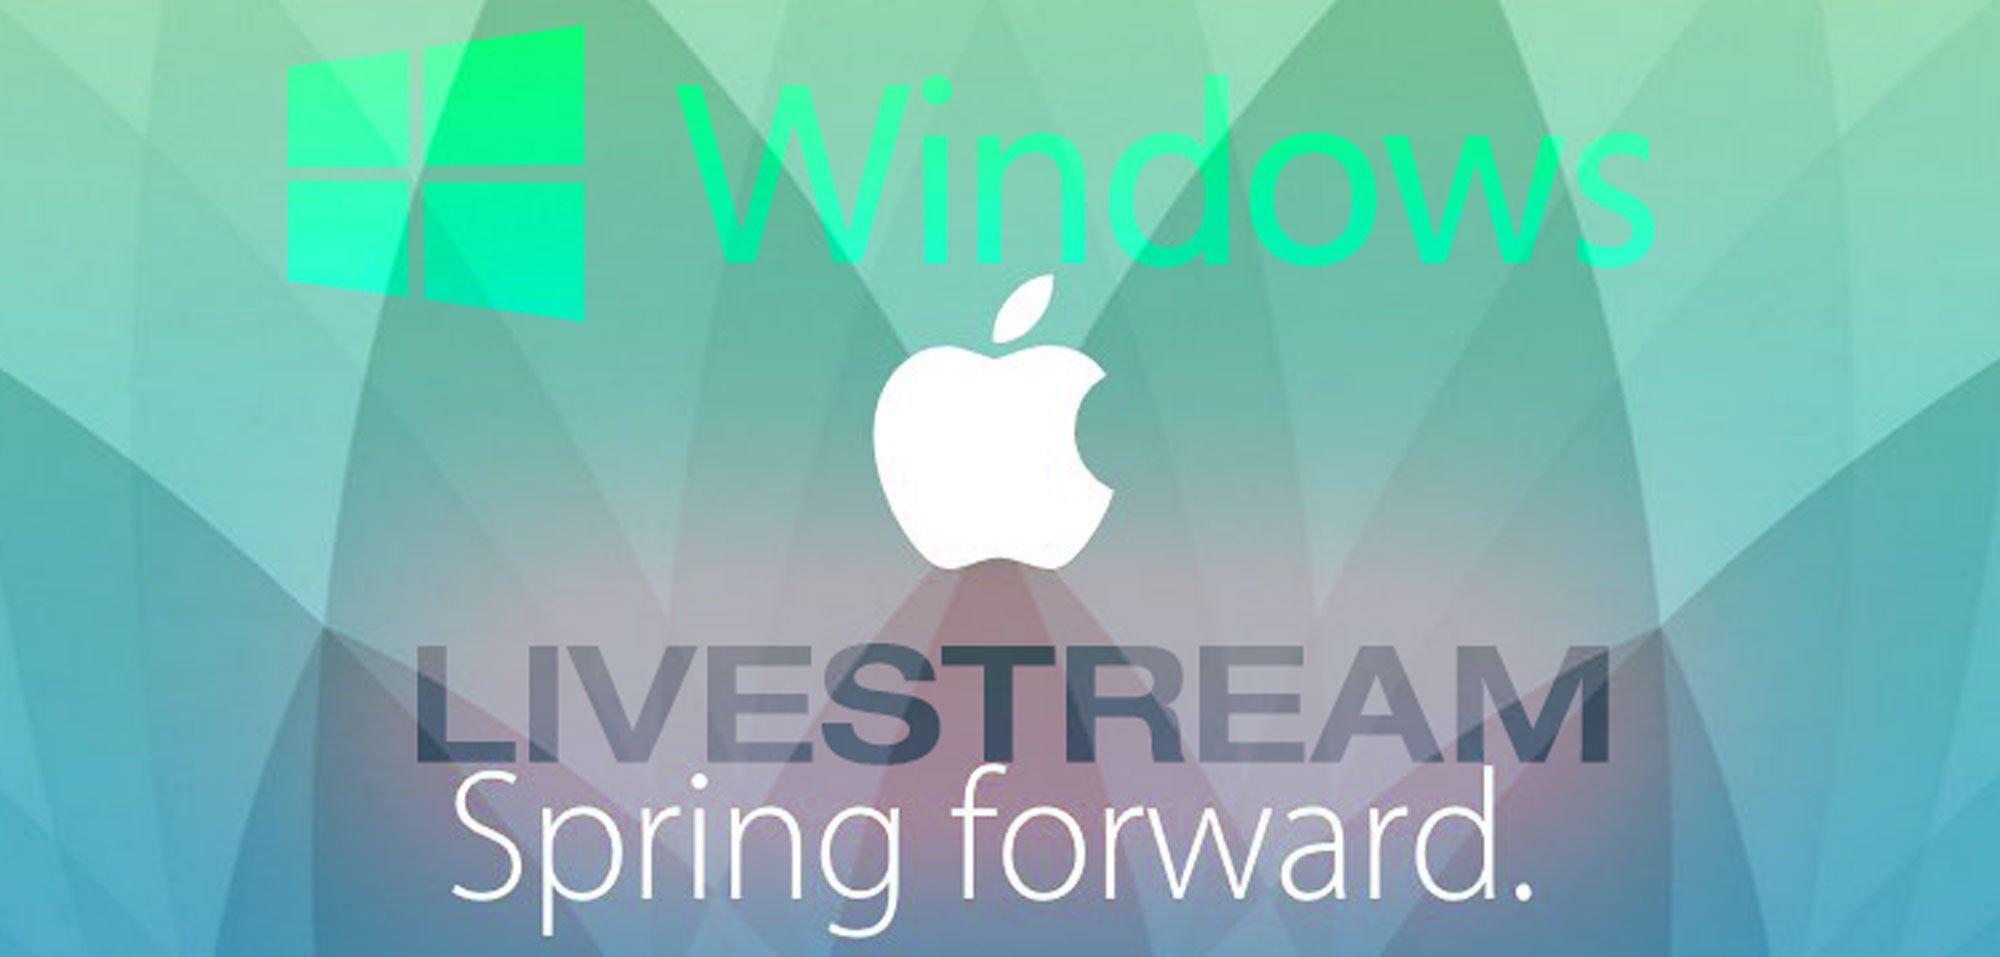 Windows Livestream Apple Watch Special Event 4